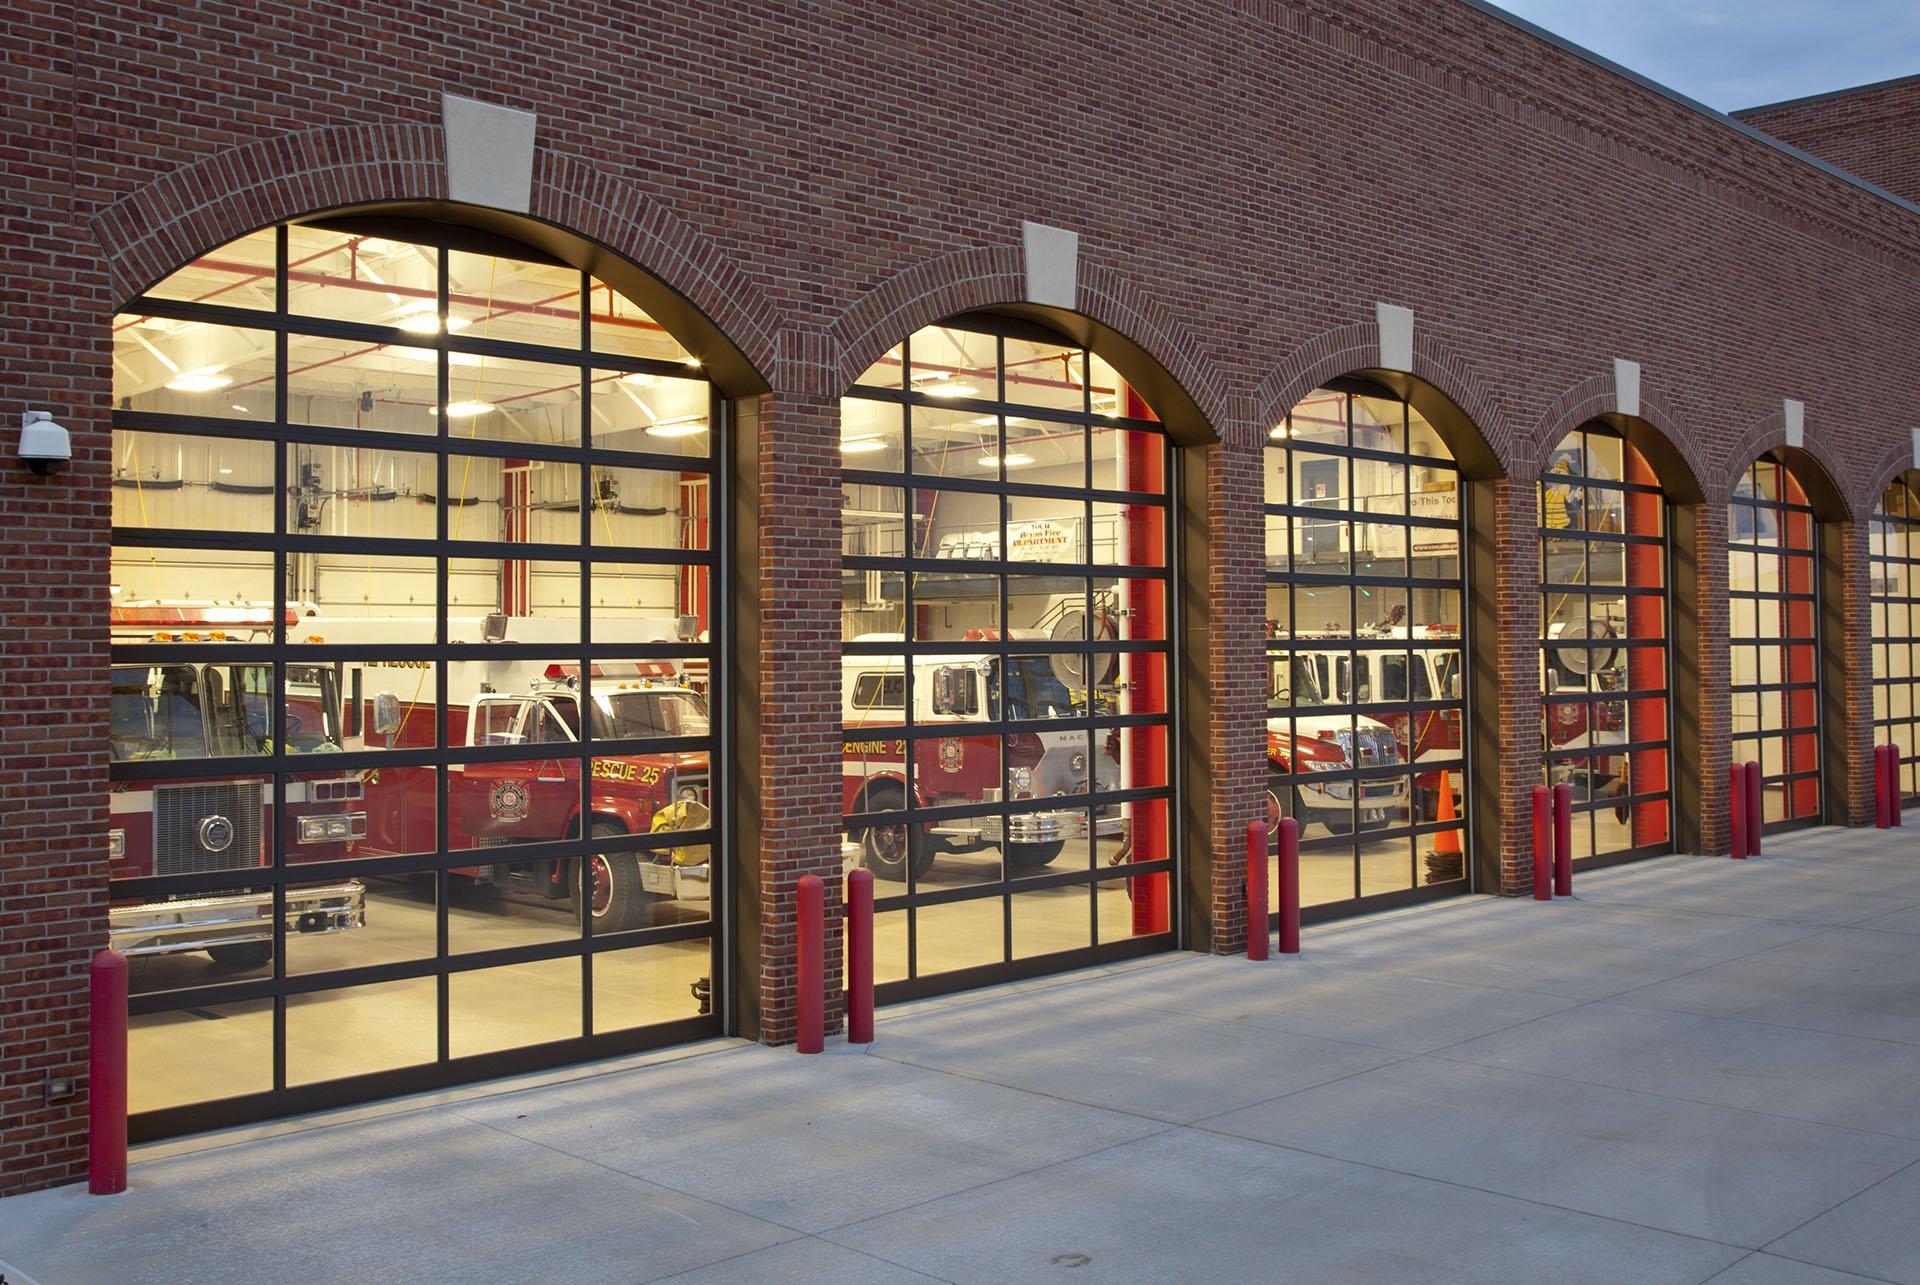 Commercial Projects Rely On Garage Doors From Haas Door